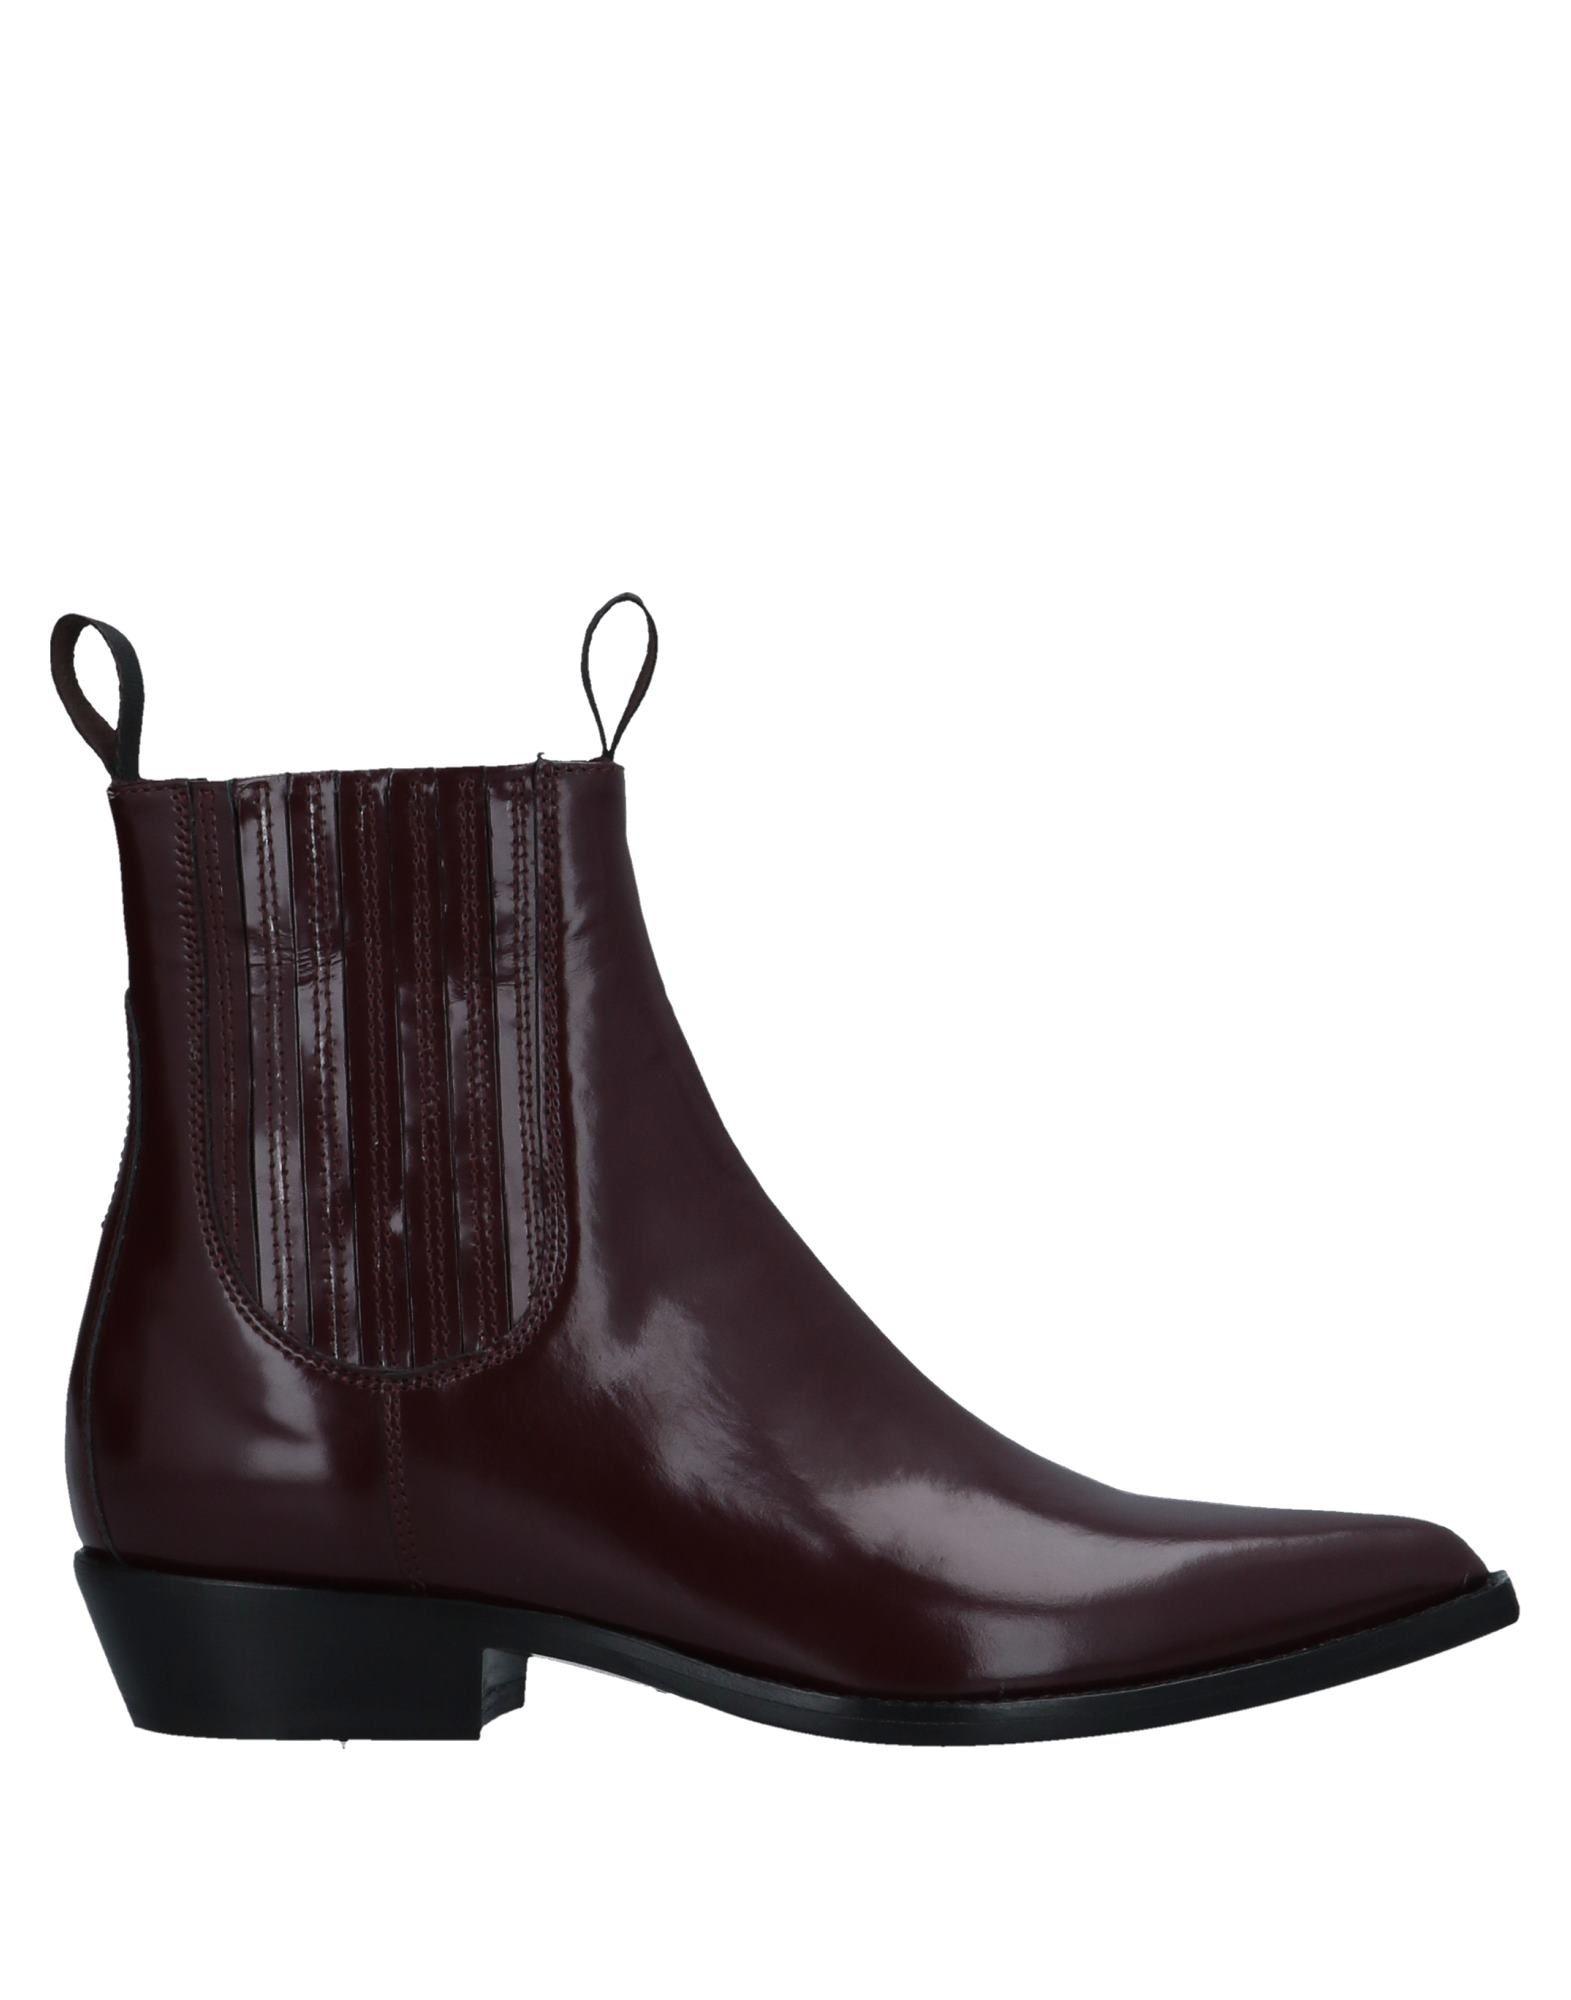 Sonora Ankle Boot - Women Sonora Ankle Ankle Ankle Boots online on  United Kingdom - 11534703UM 658db7